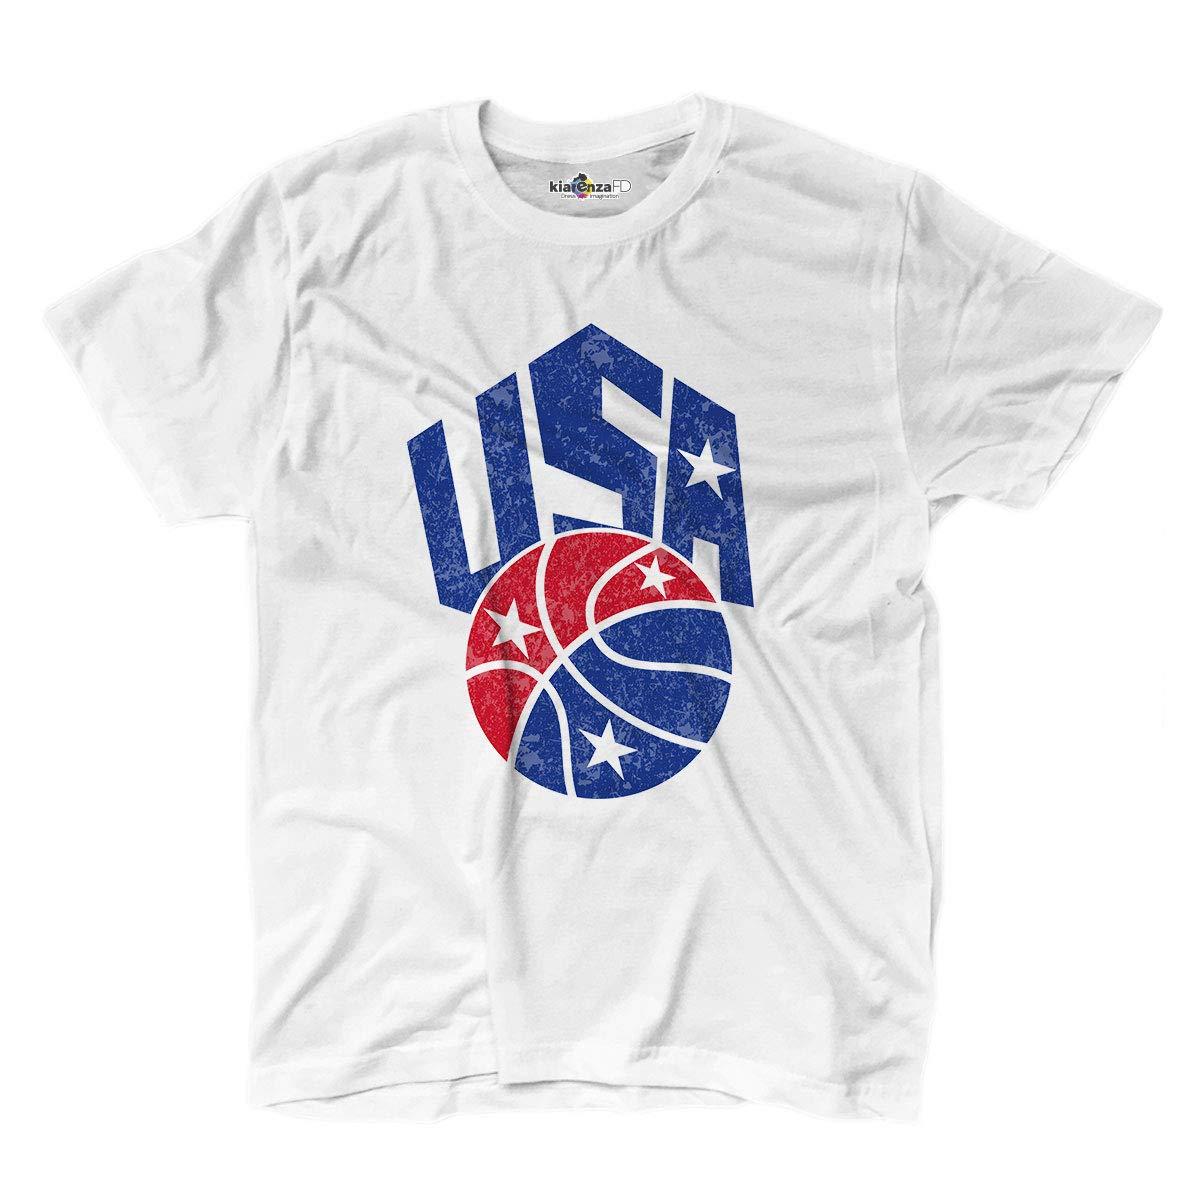 KiarenzaFD - Camiseta Camiseta de Baloncesto USA All Star Game ...